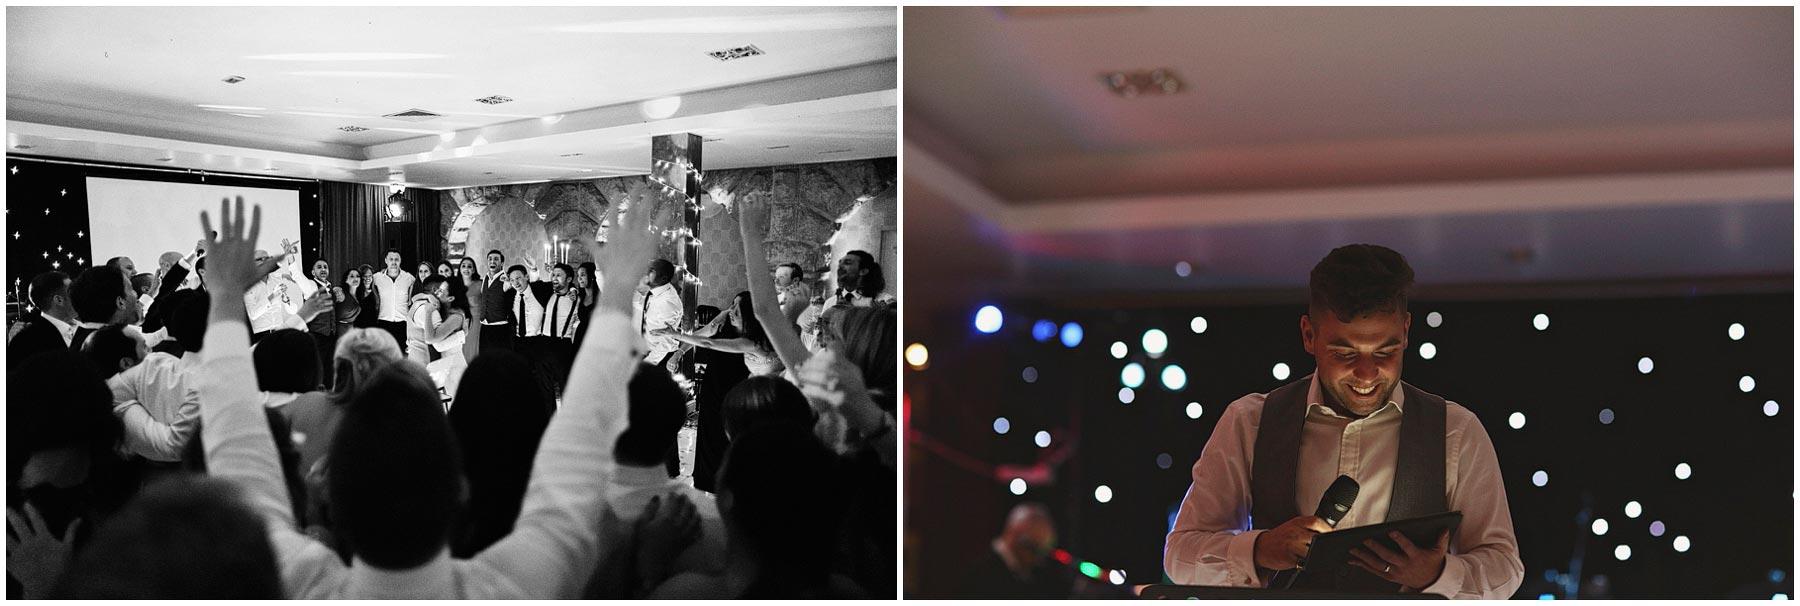 Jewish-Wedding-Photography_0146